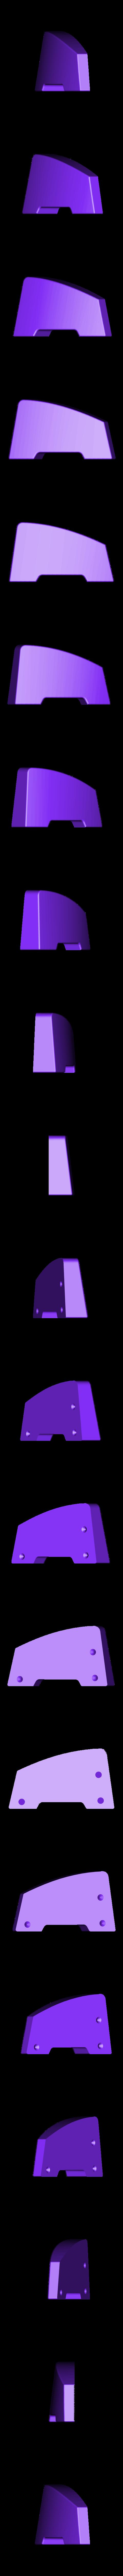 Printer_Side_R.STL Download free STL file Table Organizer - Hand Printer • 3D print design, KuKu